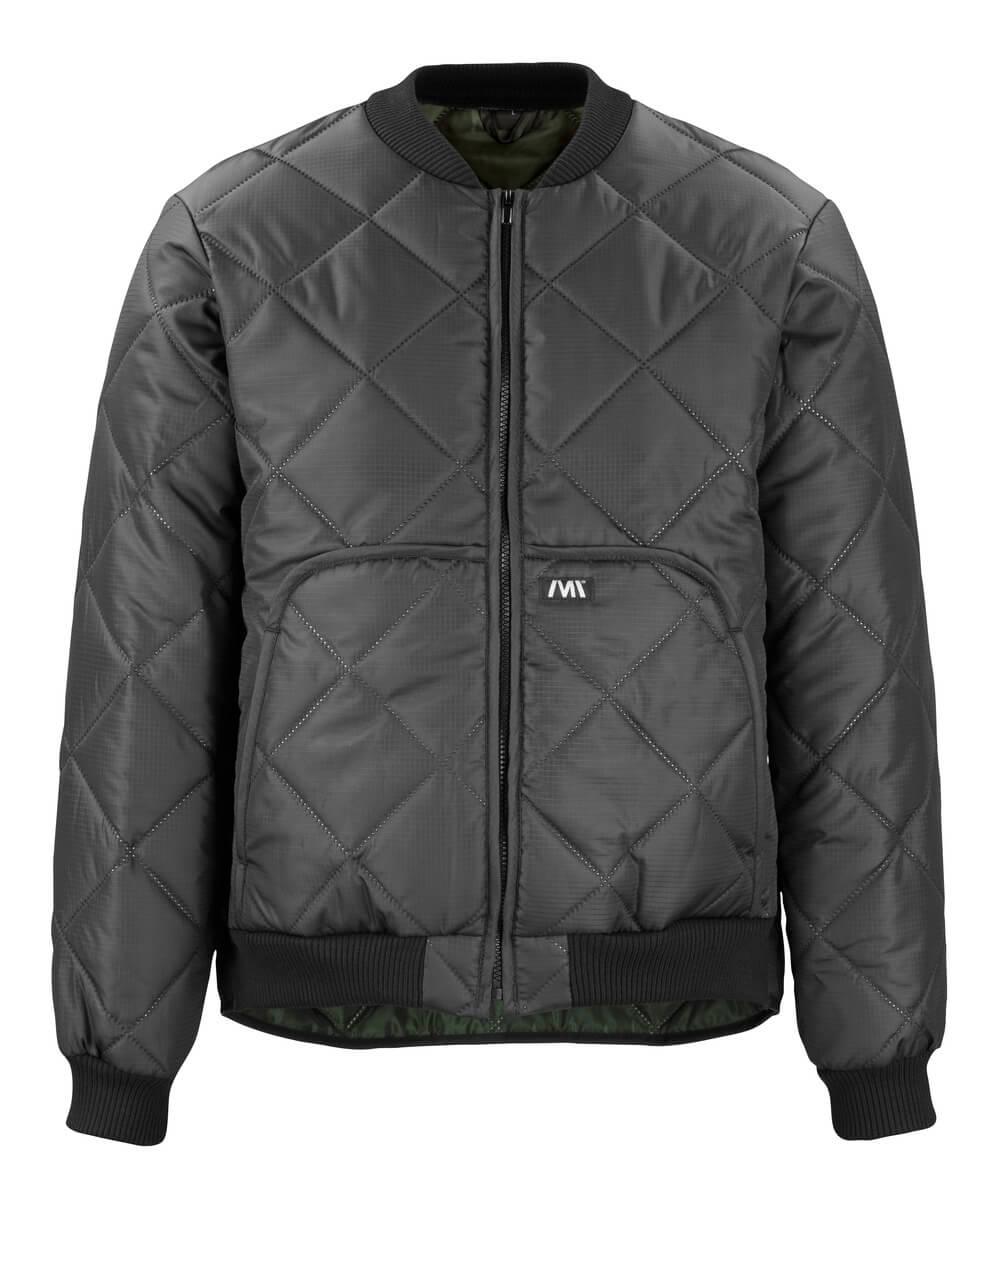 04615-701-09 Jacket - black